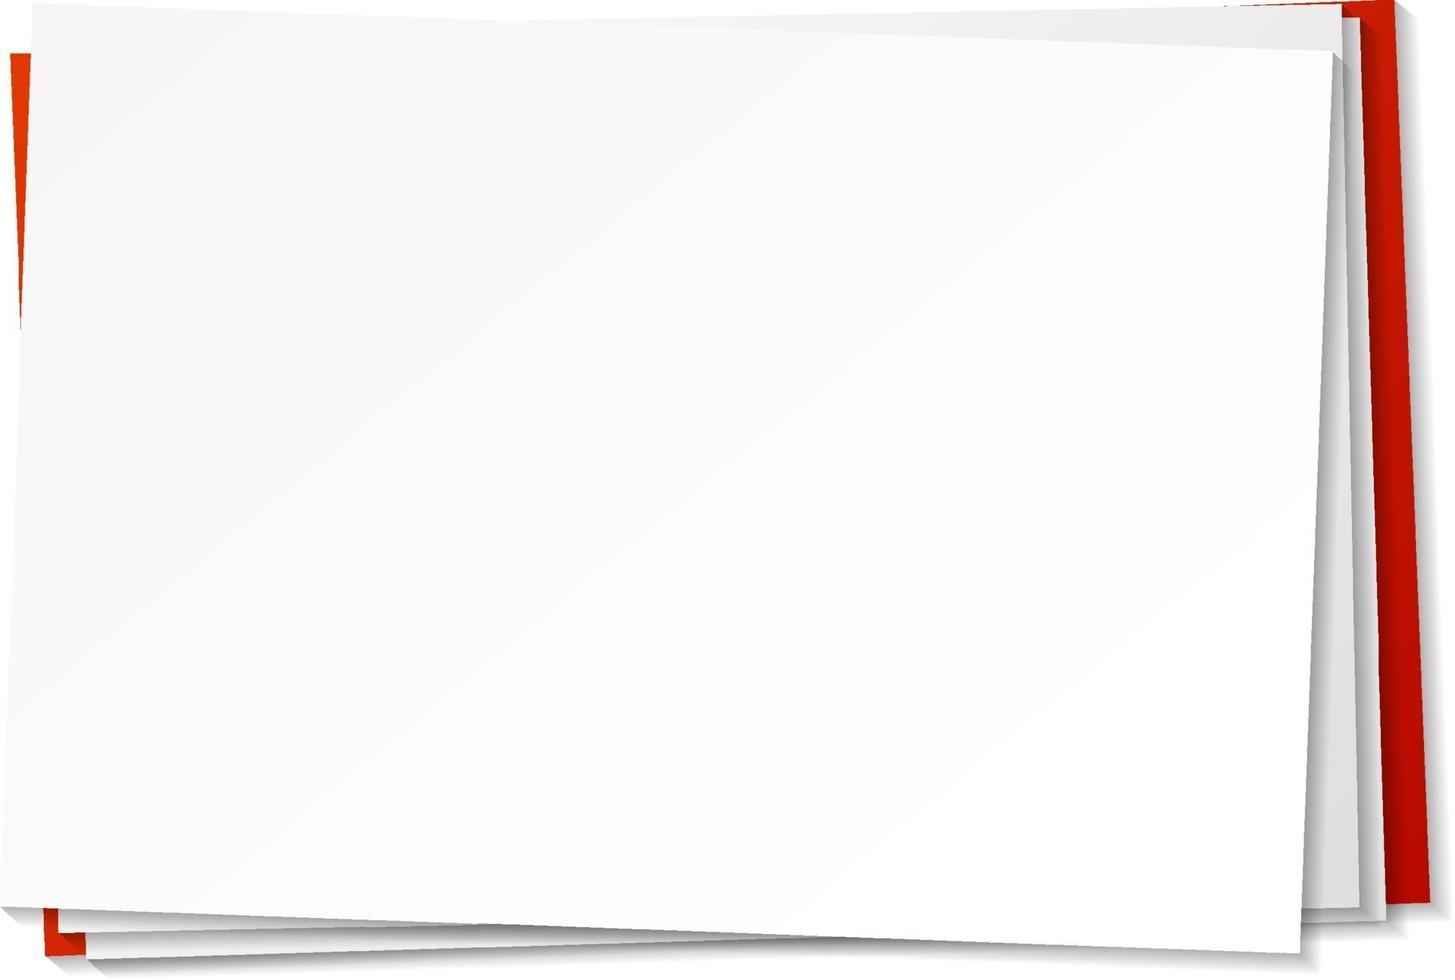 blank pappersmall på vit bakgrund vektor